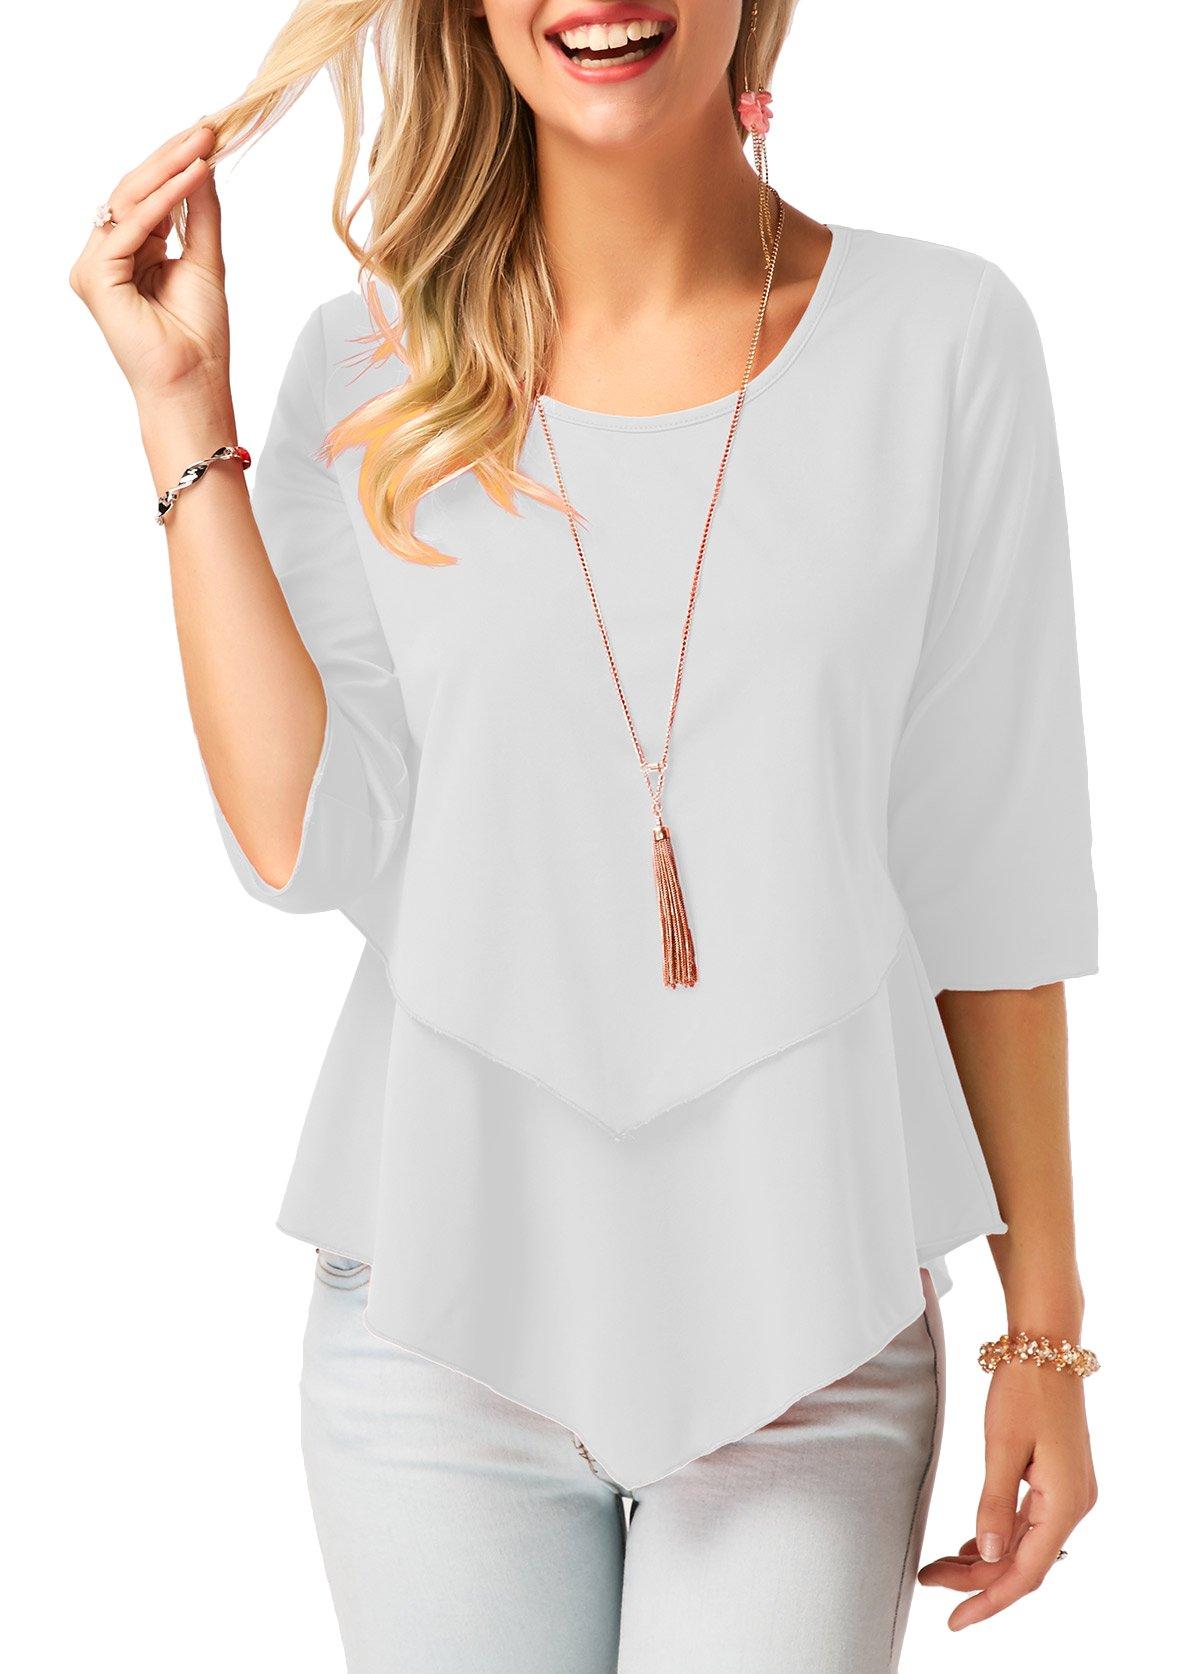 Women Solid White Plain T Shirt Hi-Low Layered Hem Blouse 3/4 Sleeve Tunic Tops